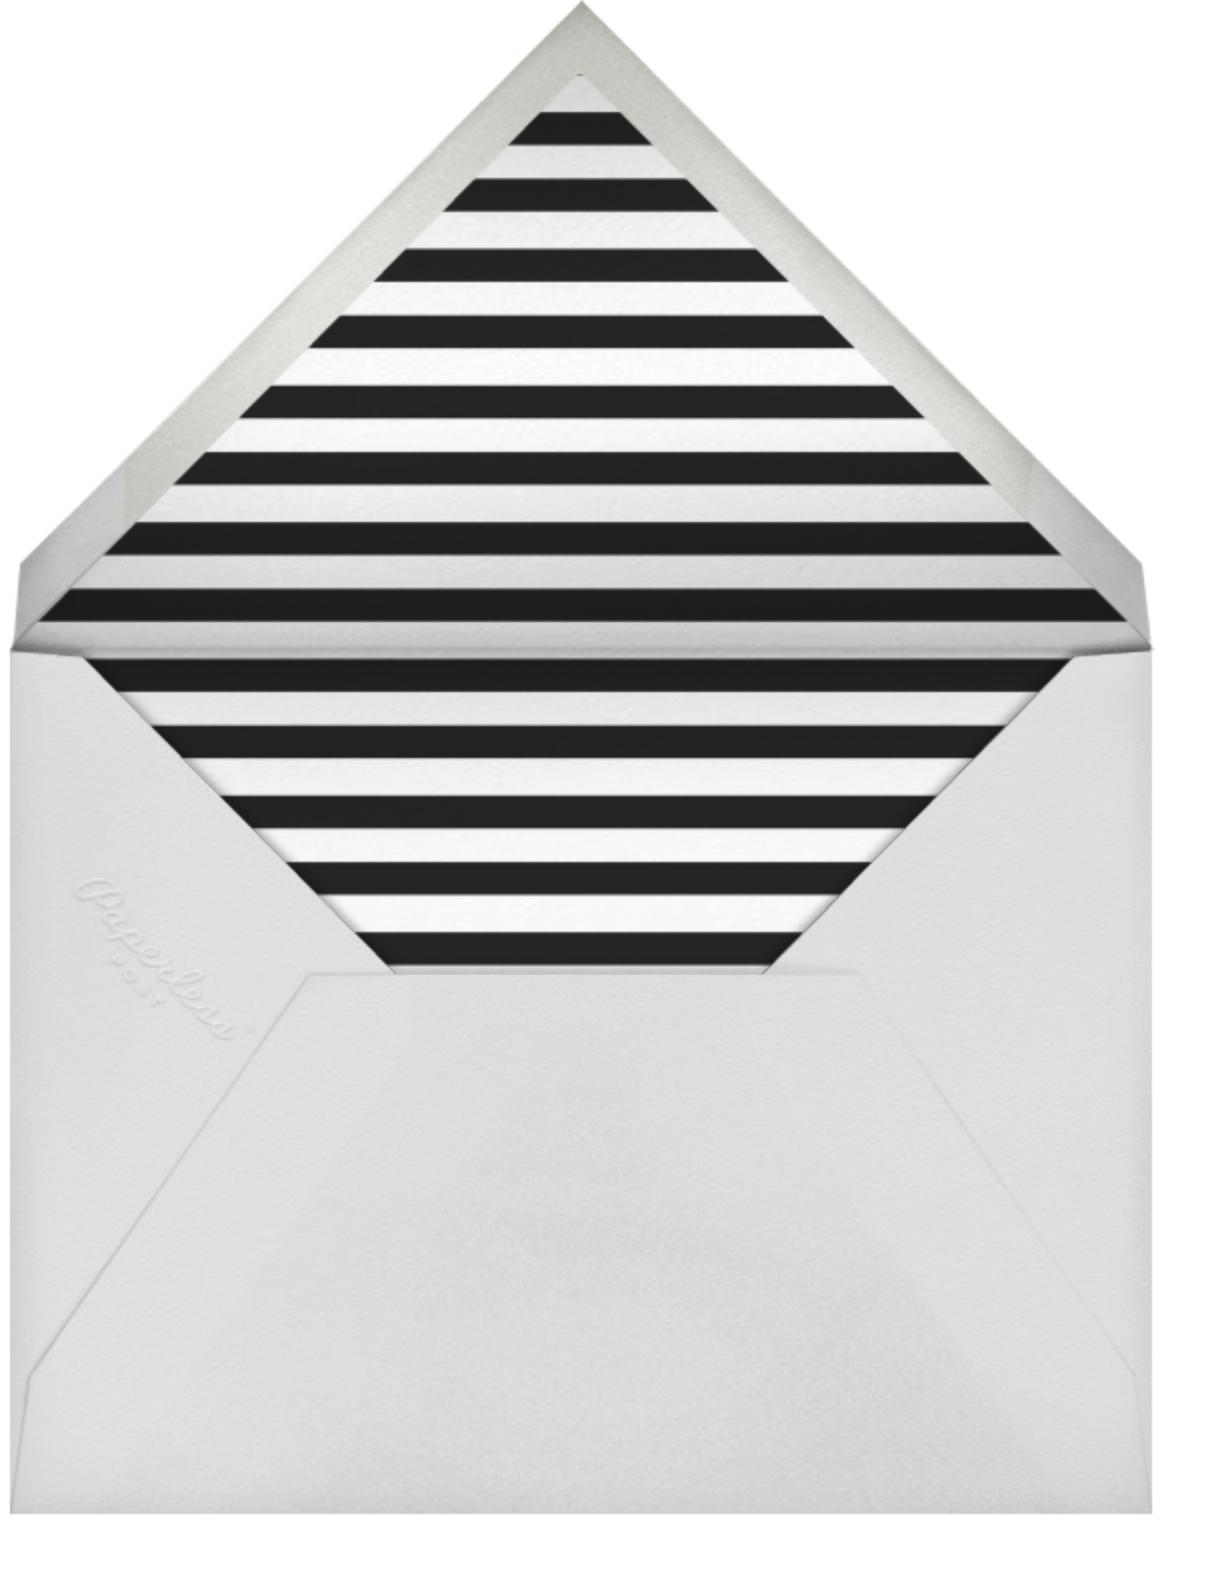 Confetti Horizontal (Double-Sided Photo) - Silver - kate spade new york - Wedding stationery - envelope back